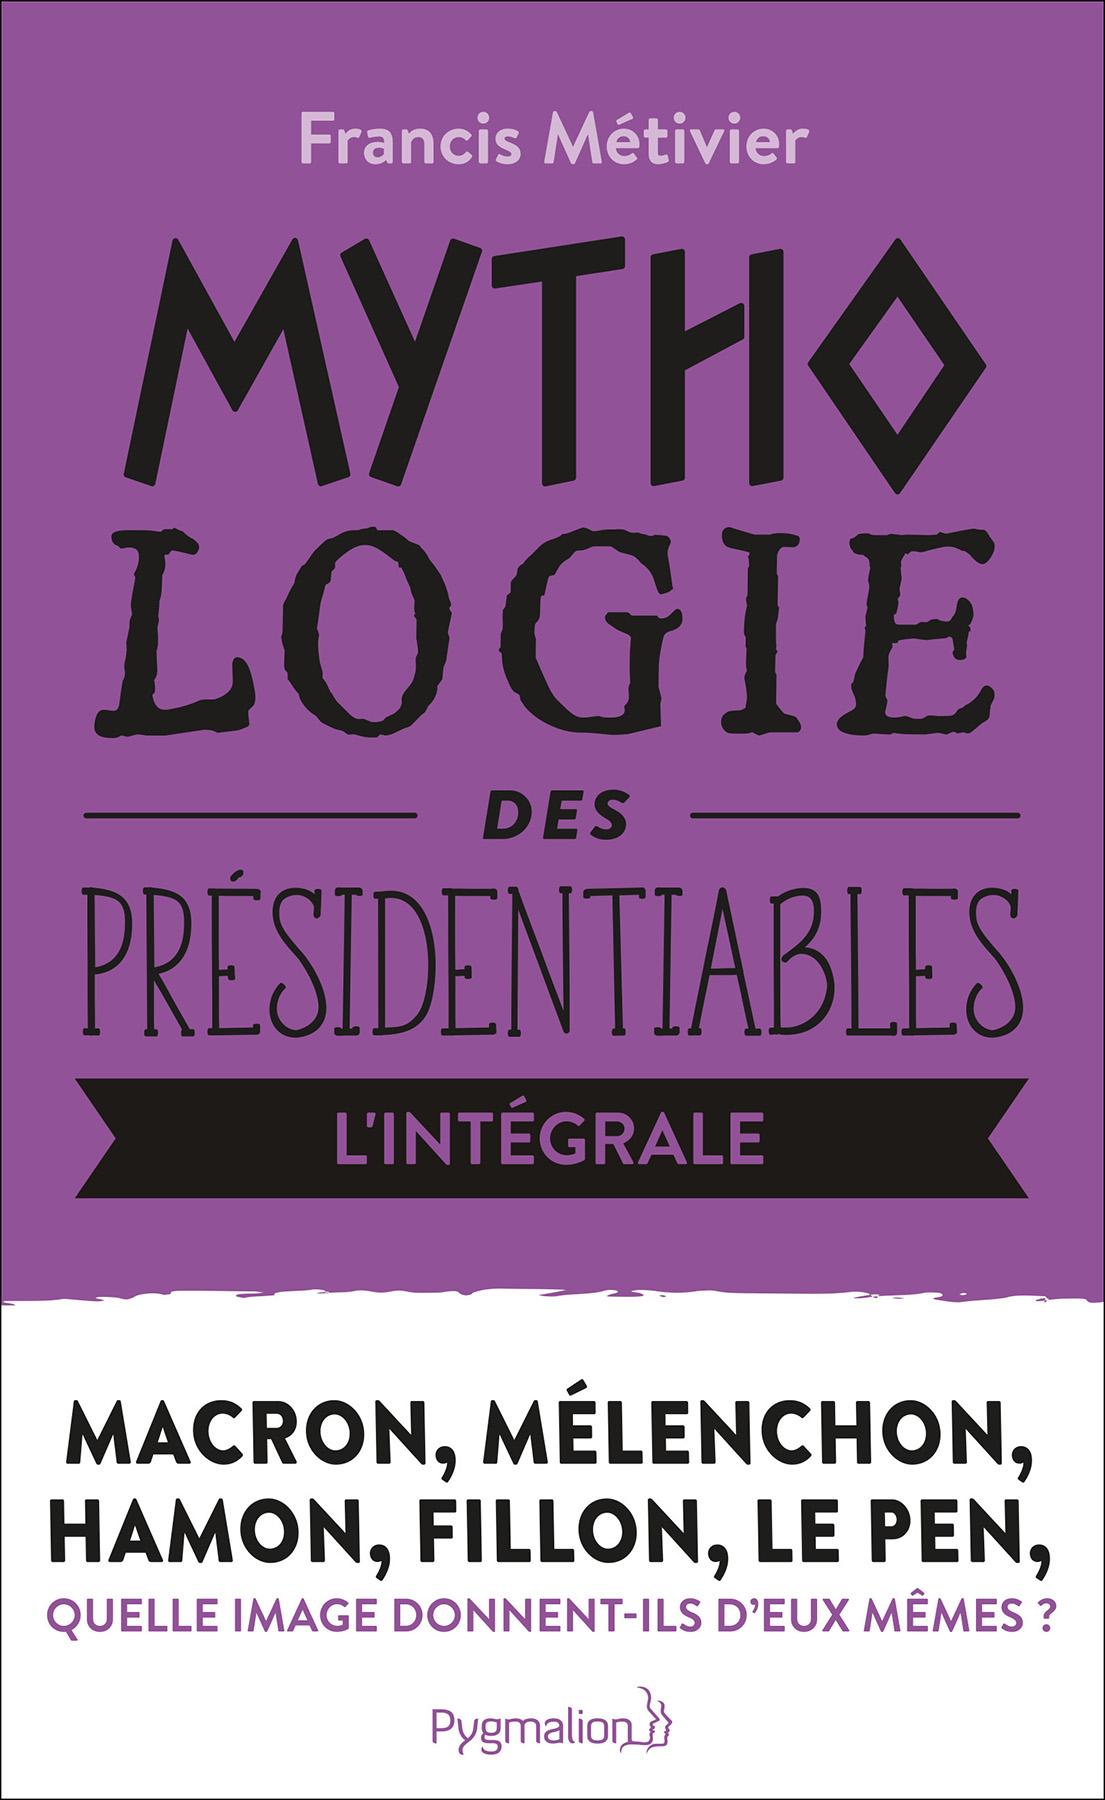 Fillon, Hamon, Le Pen, Macr...